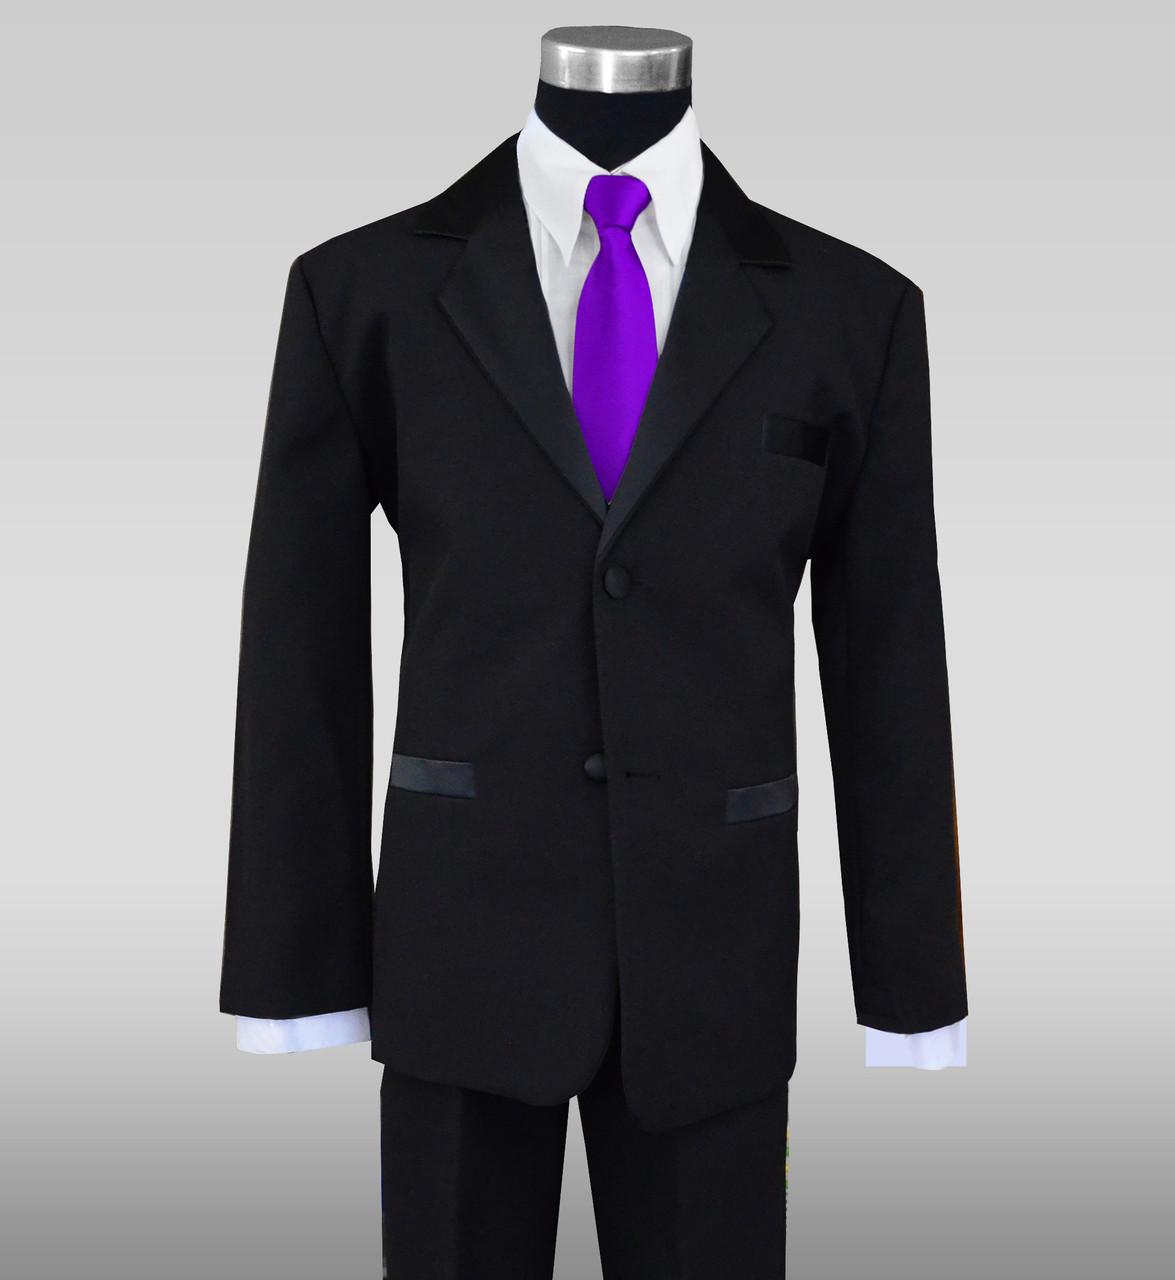 Youth Boys Tuxedo Dresswear Suit With A Light Purple Neck